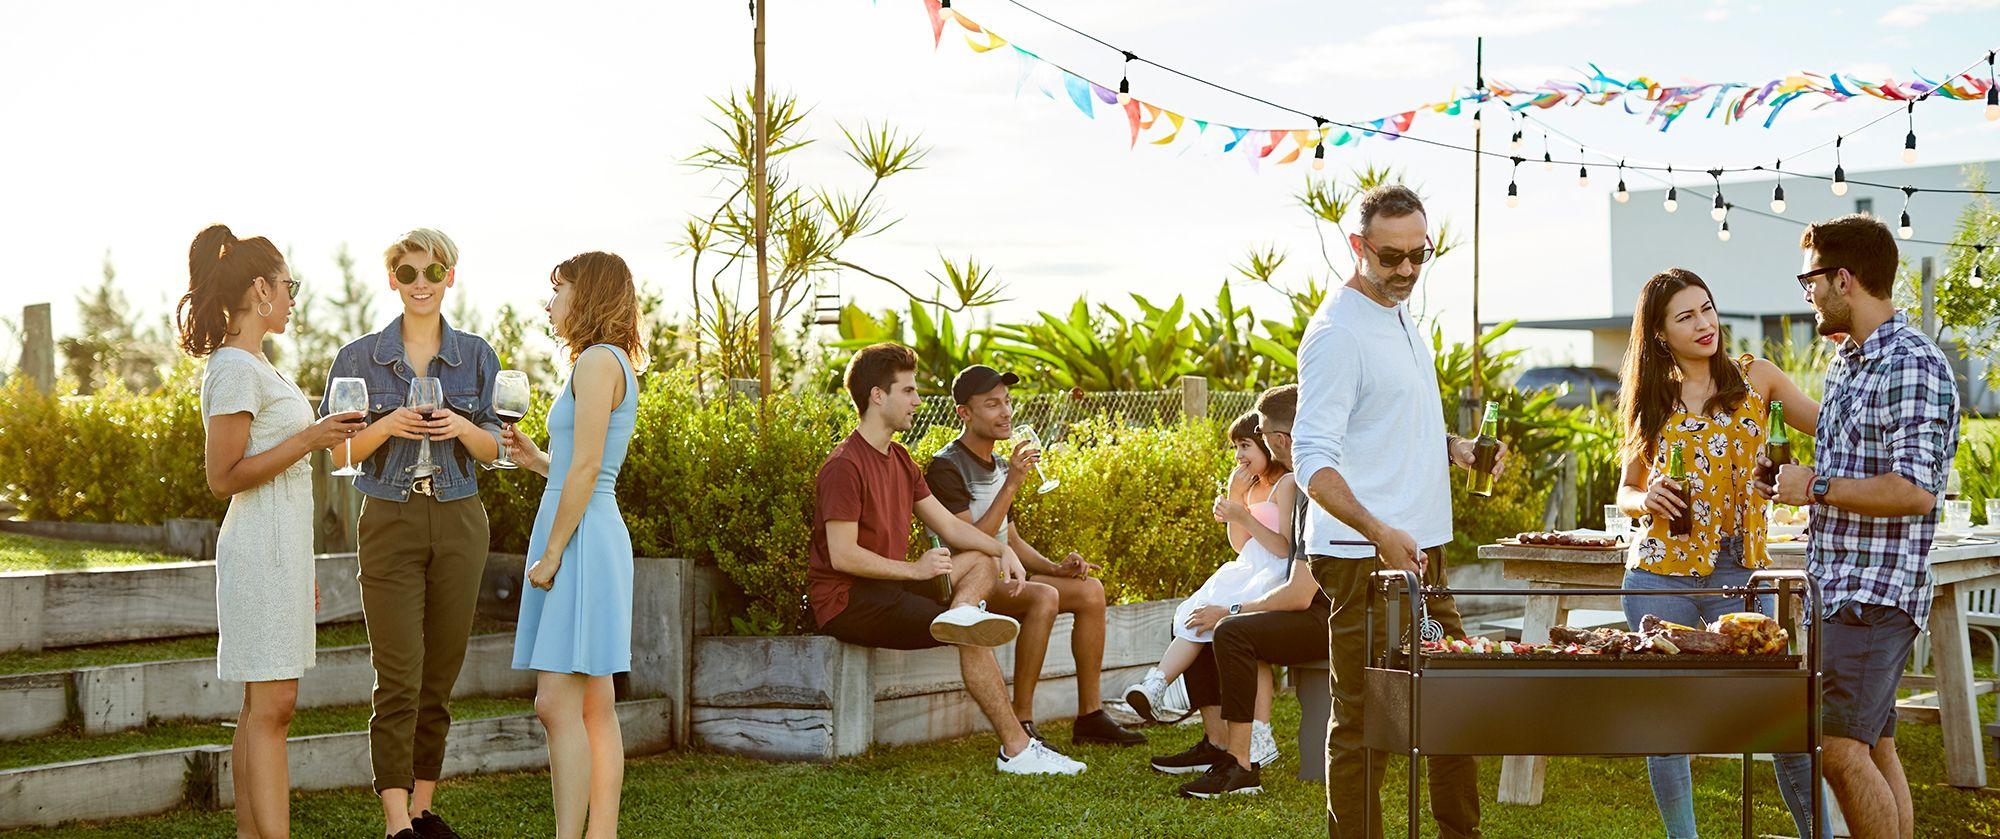 People having a BBQ in a backyard.